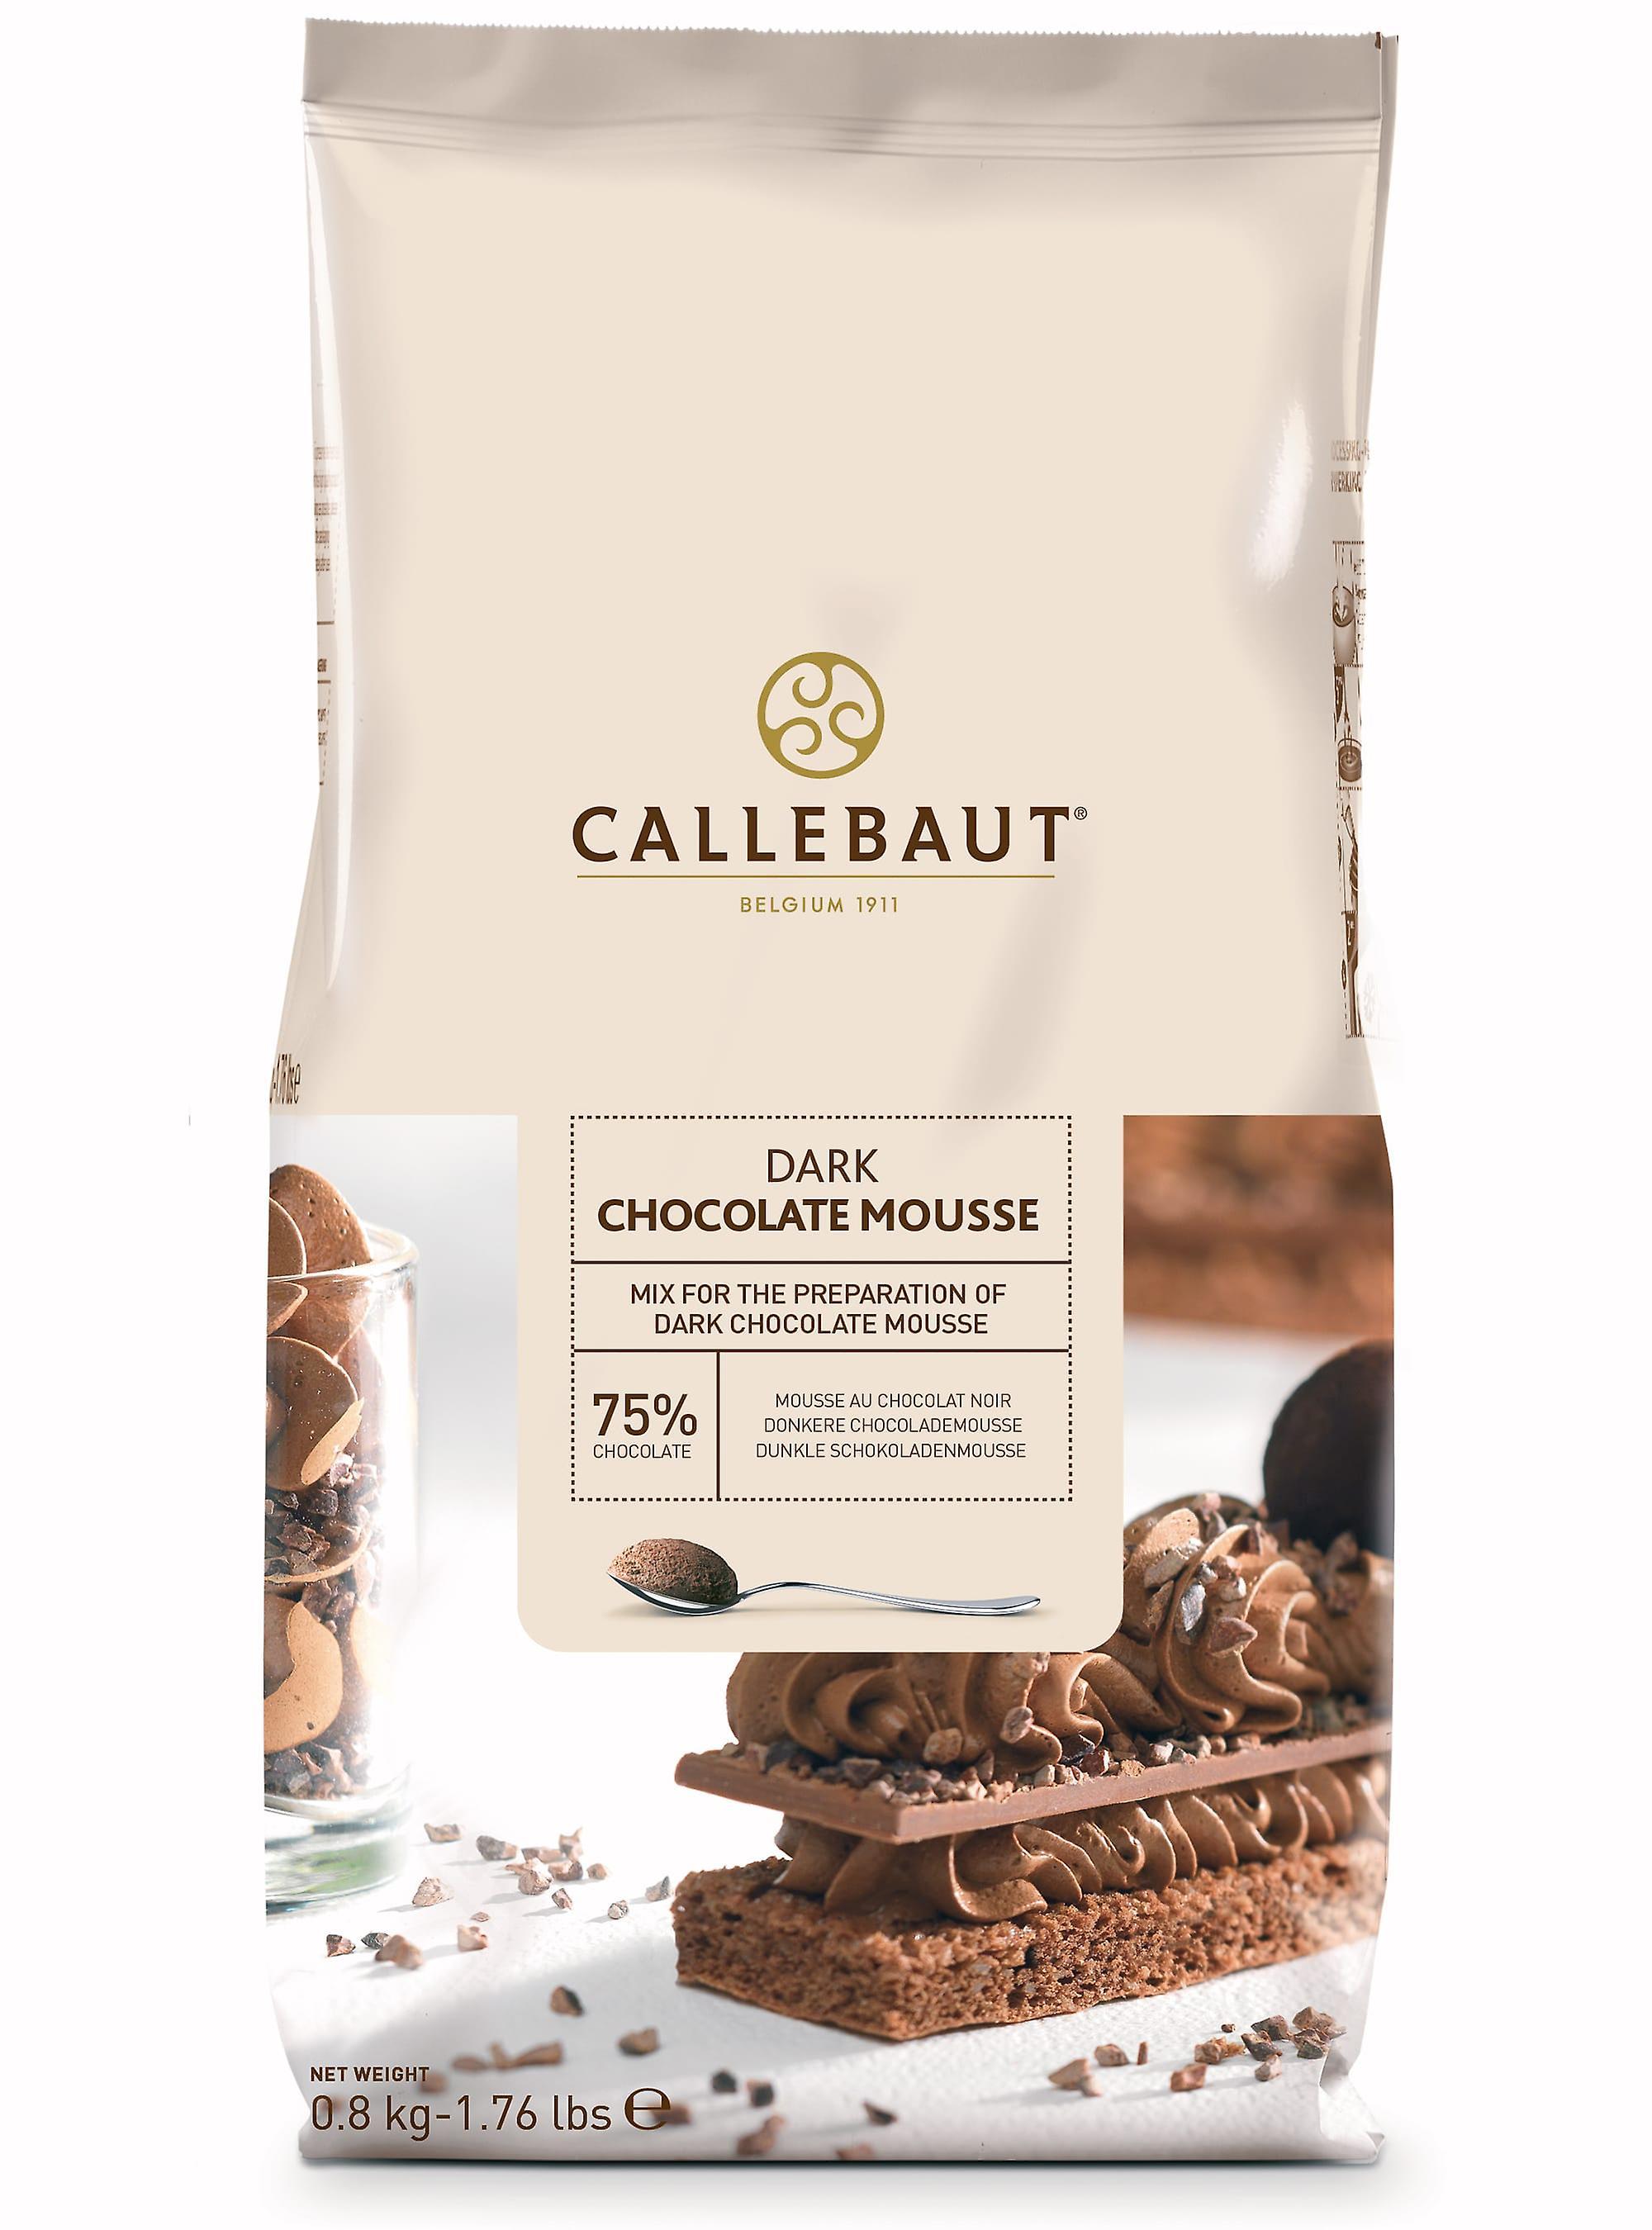 Callebaut Dark Chocolate Mousse Powder Mix